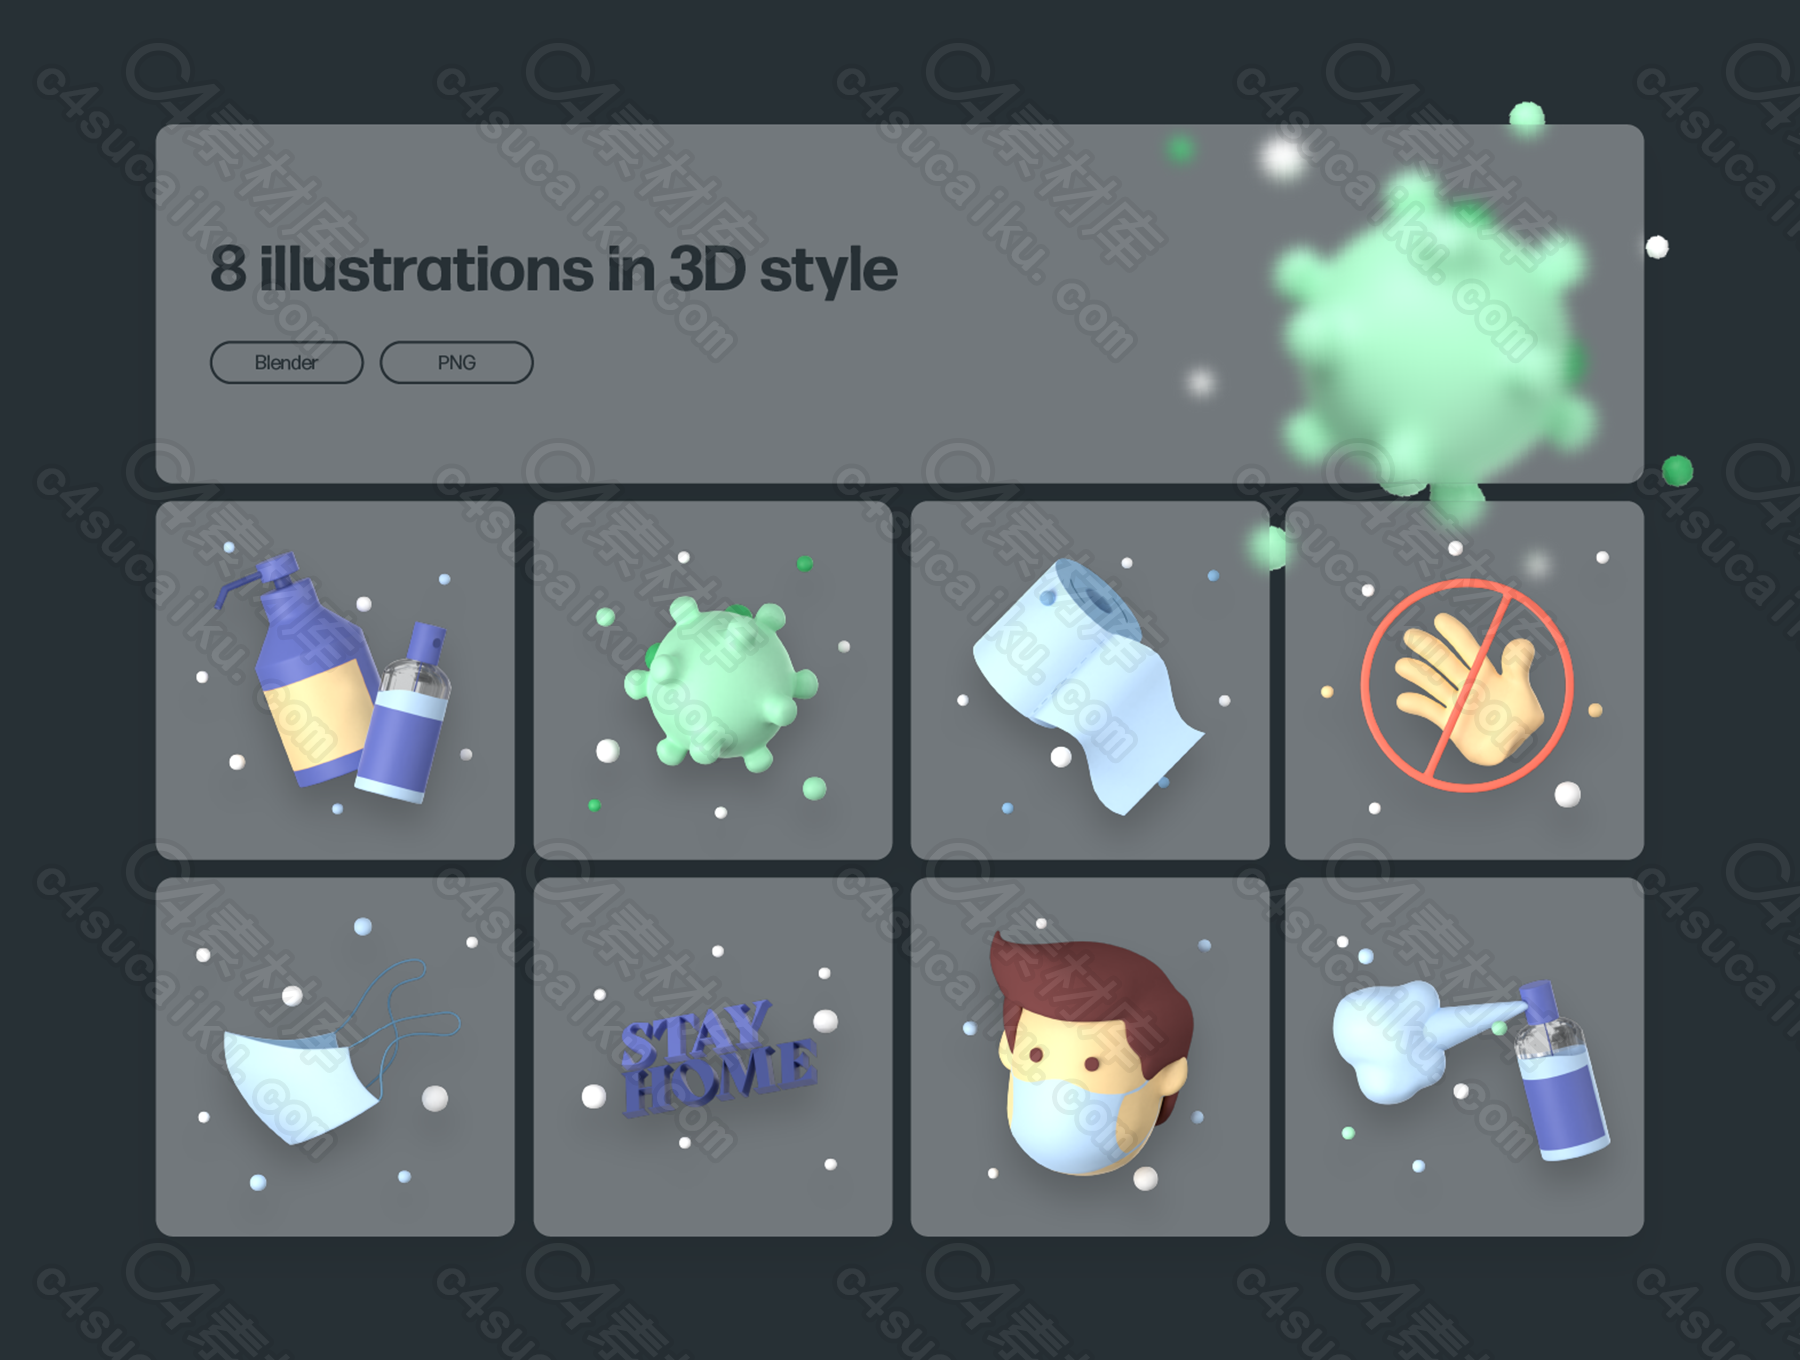 C4素材网-Blender工程-冠状病毒 3D 包